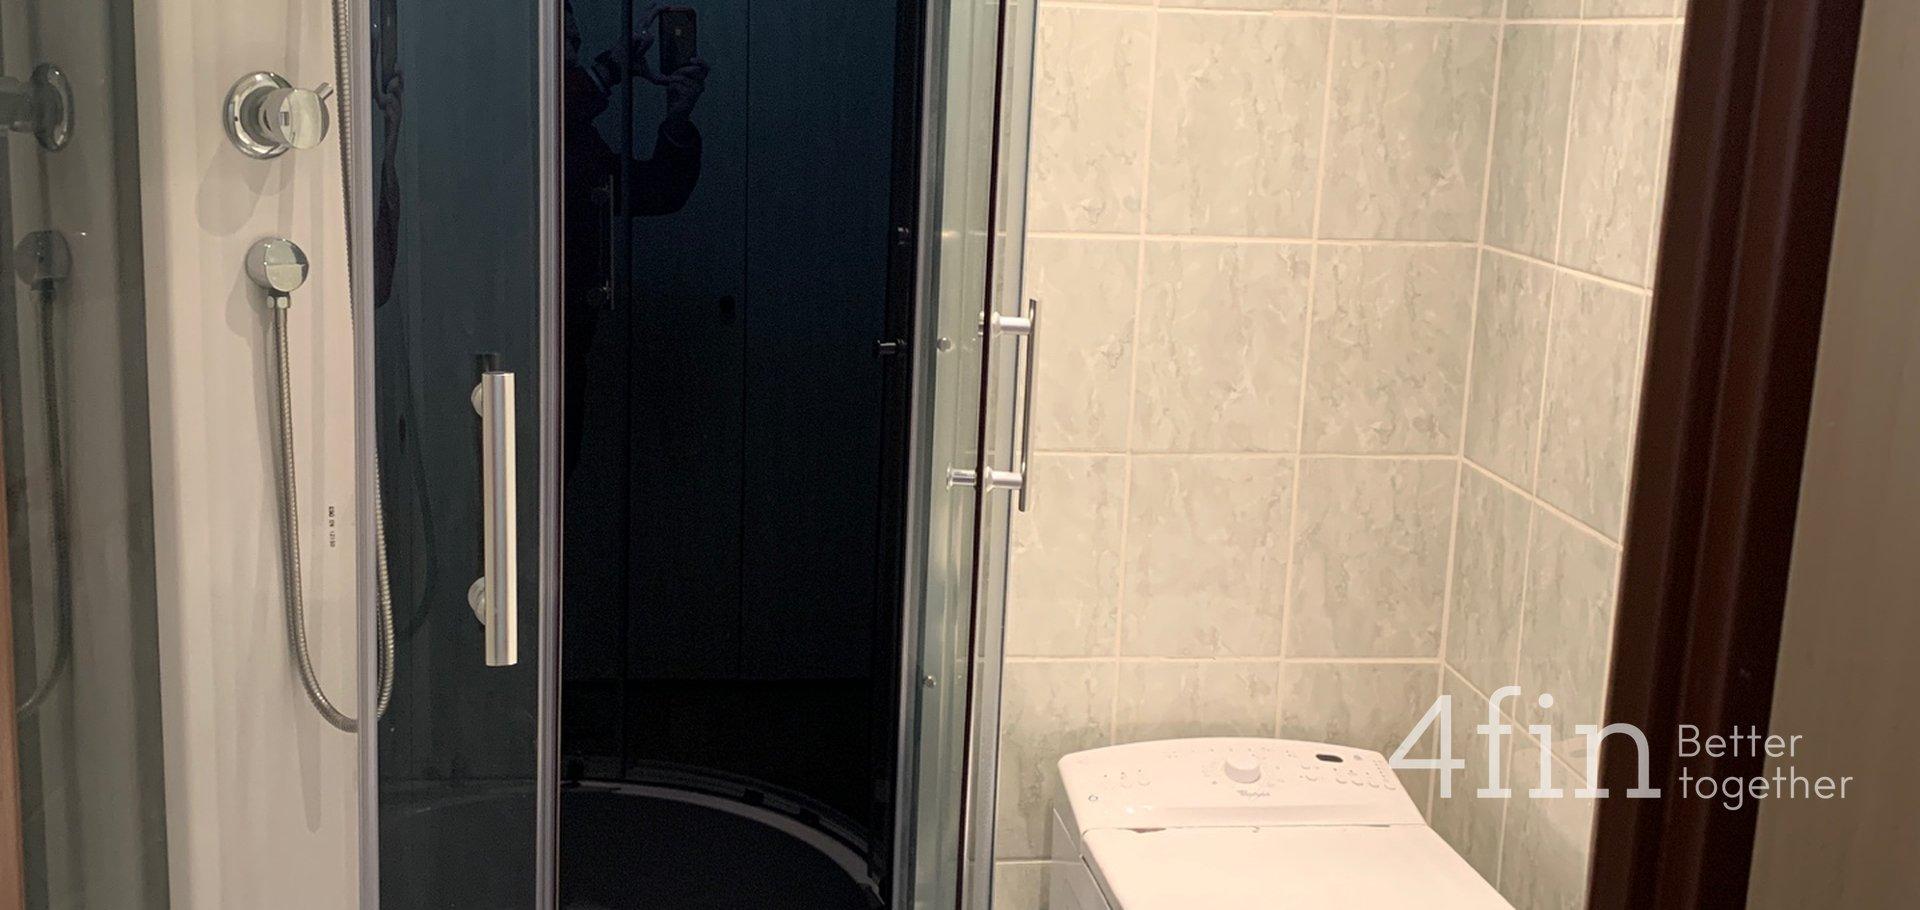 Pronájem, Byty 2+1, 52m² - Ostrava - Poruba